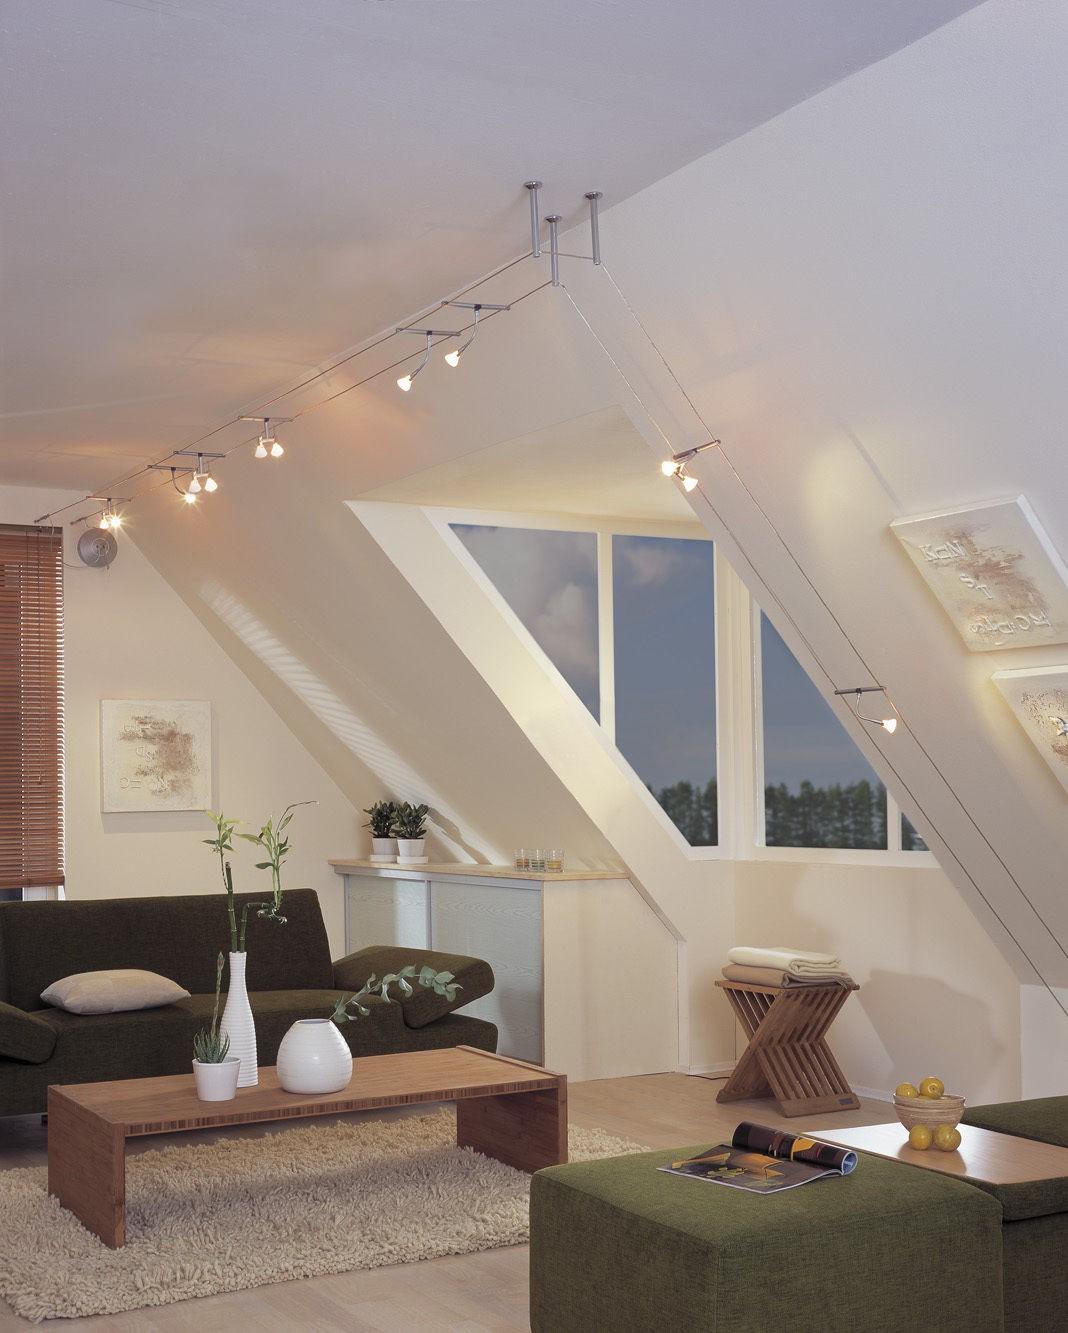 paulmann halogen seil spot 12v seilsystem 160mm seilabstand gu5 3 gu4 g4. Black Bedroom Furniture Sets. Home Design Ideas